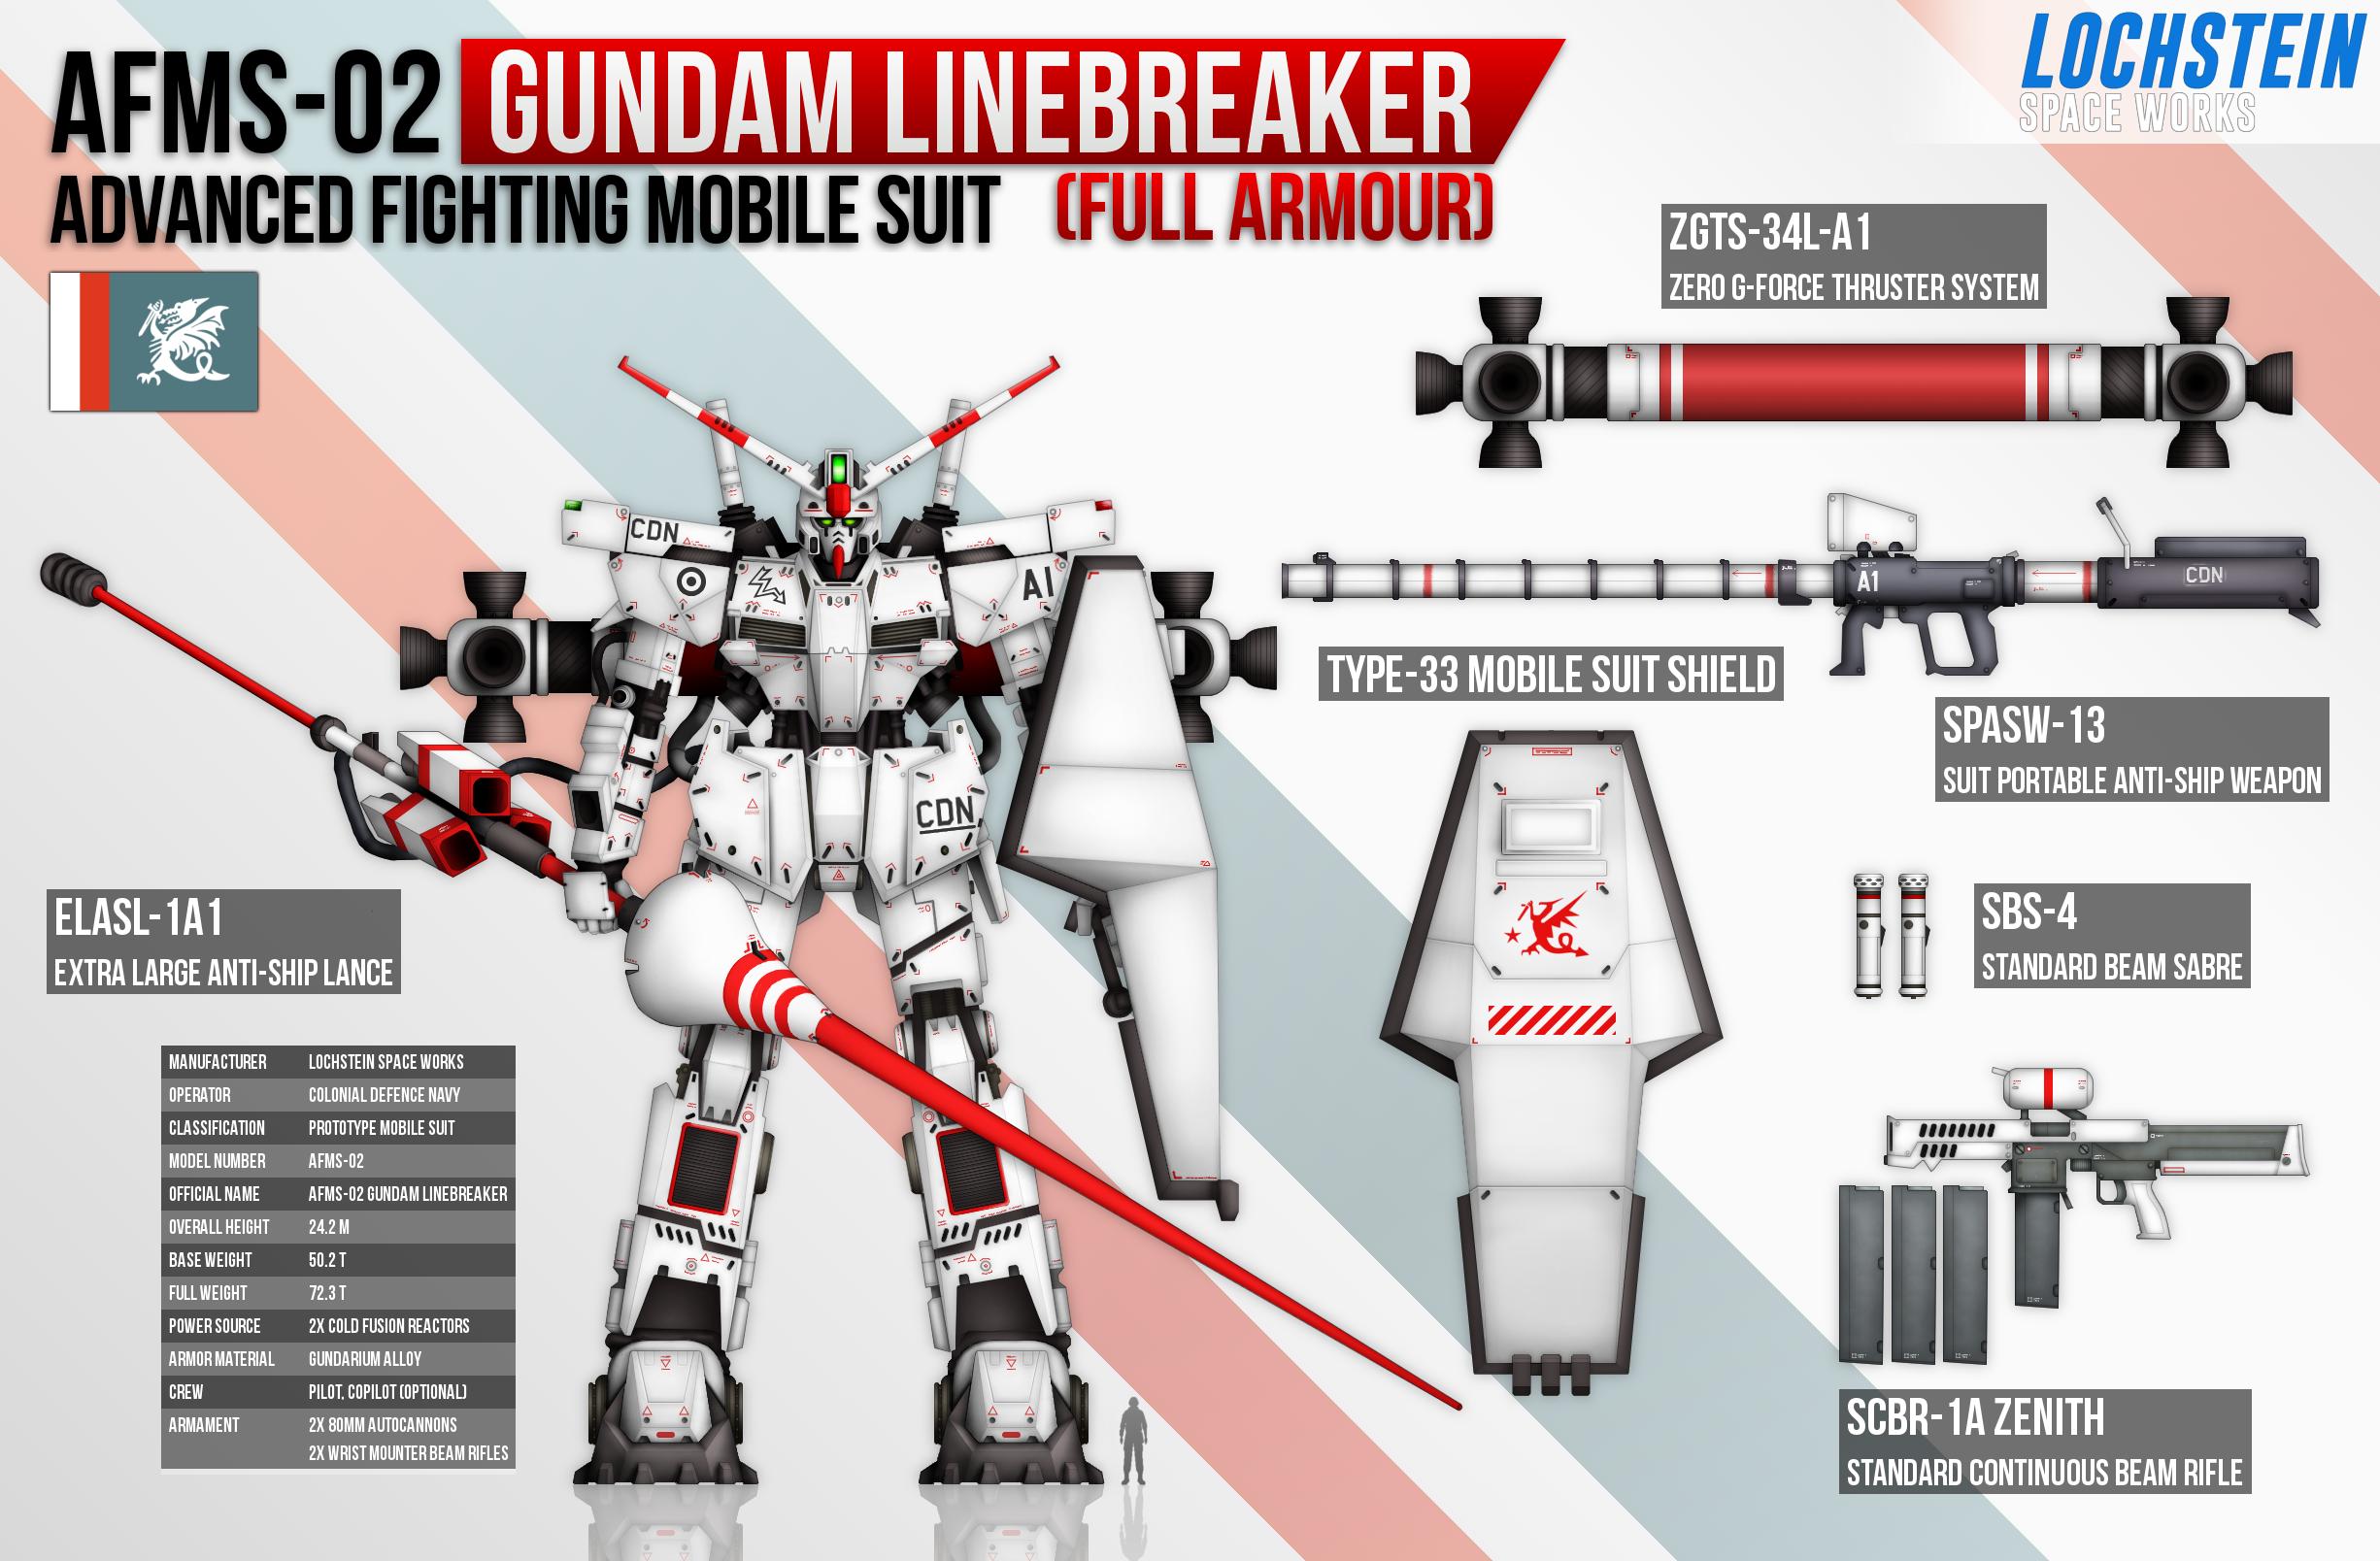 AFMS-02 Gundam Linebreaker by CountGooseman